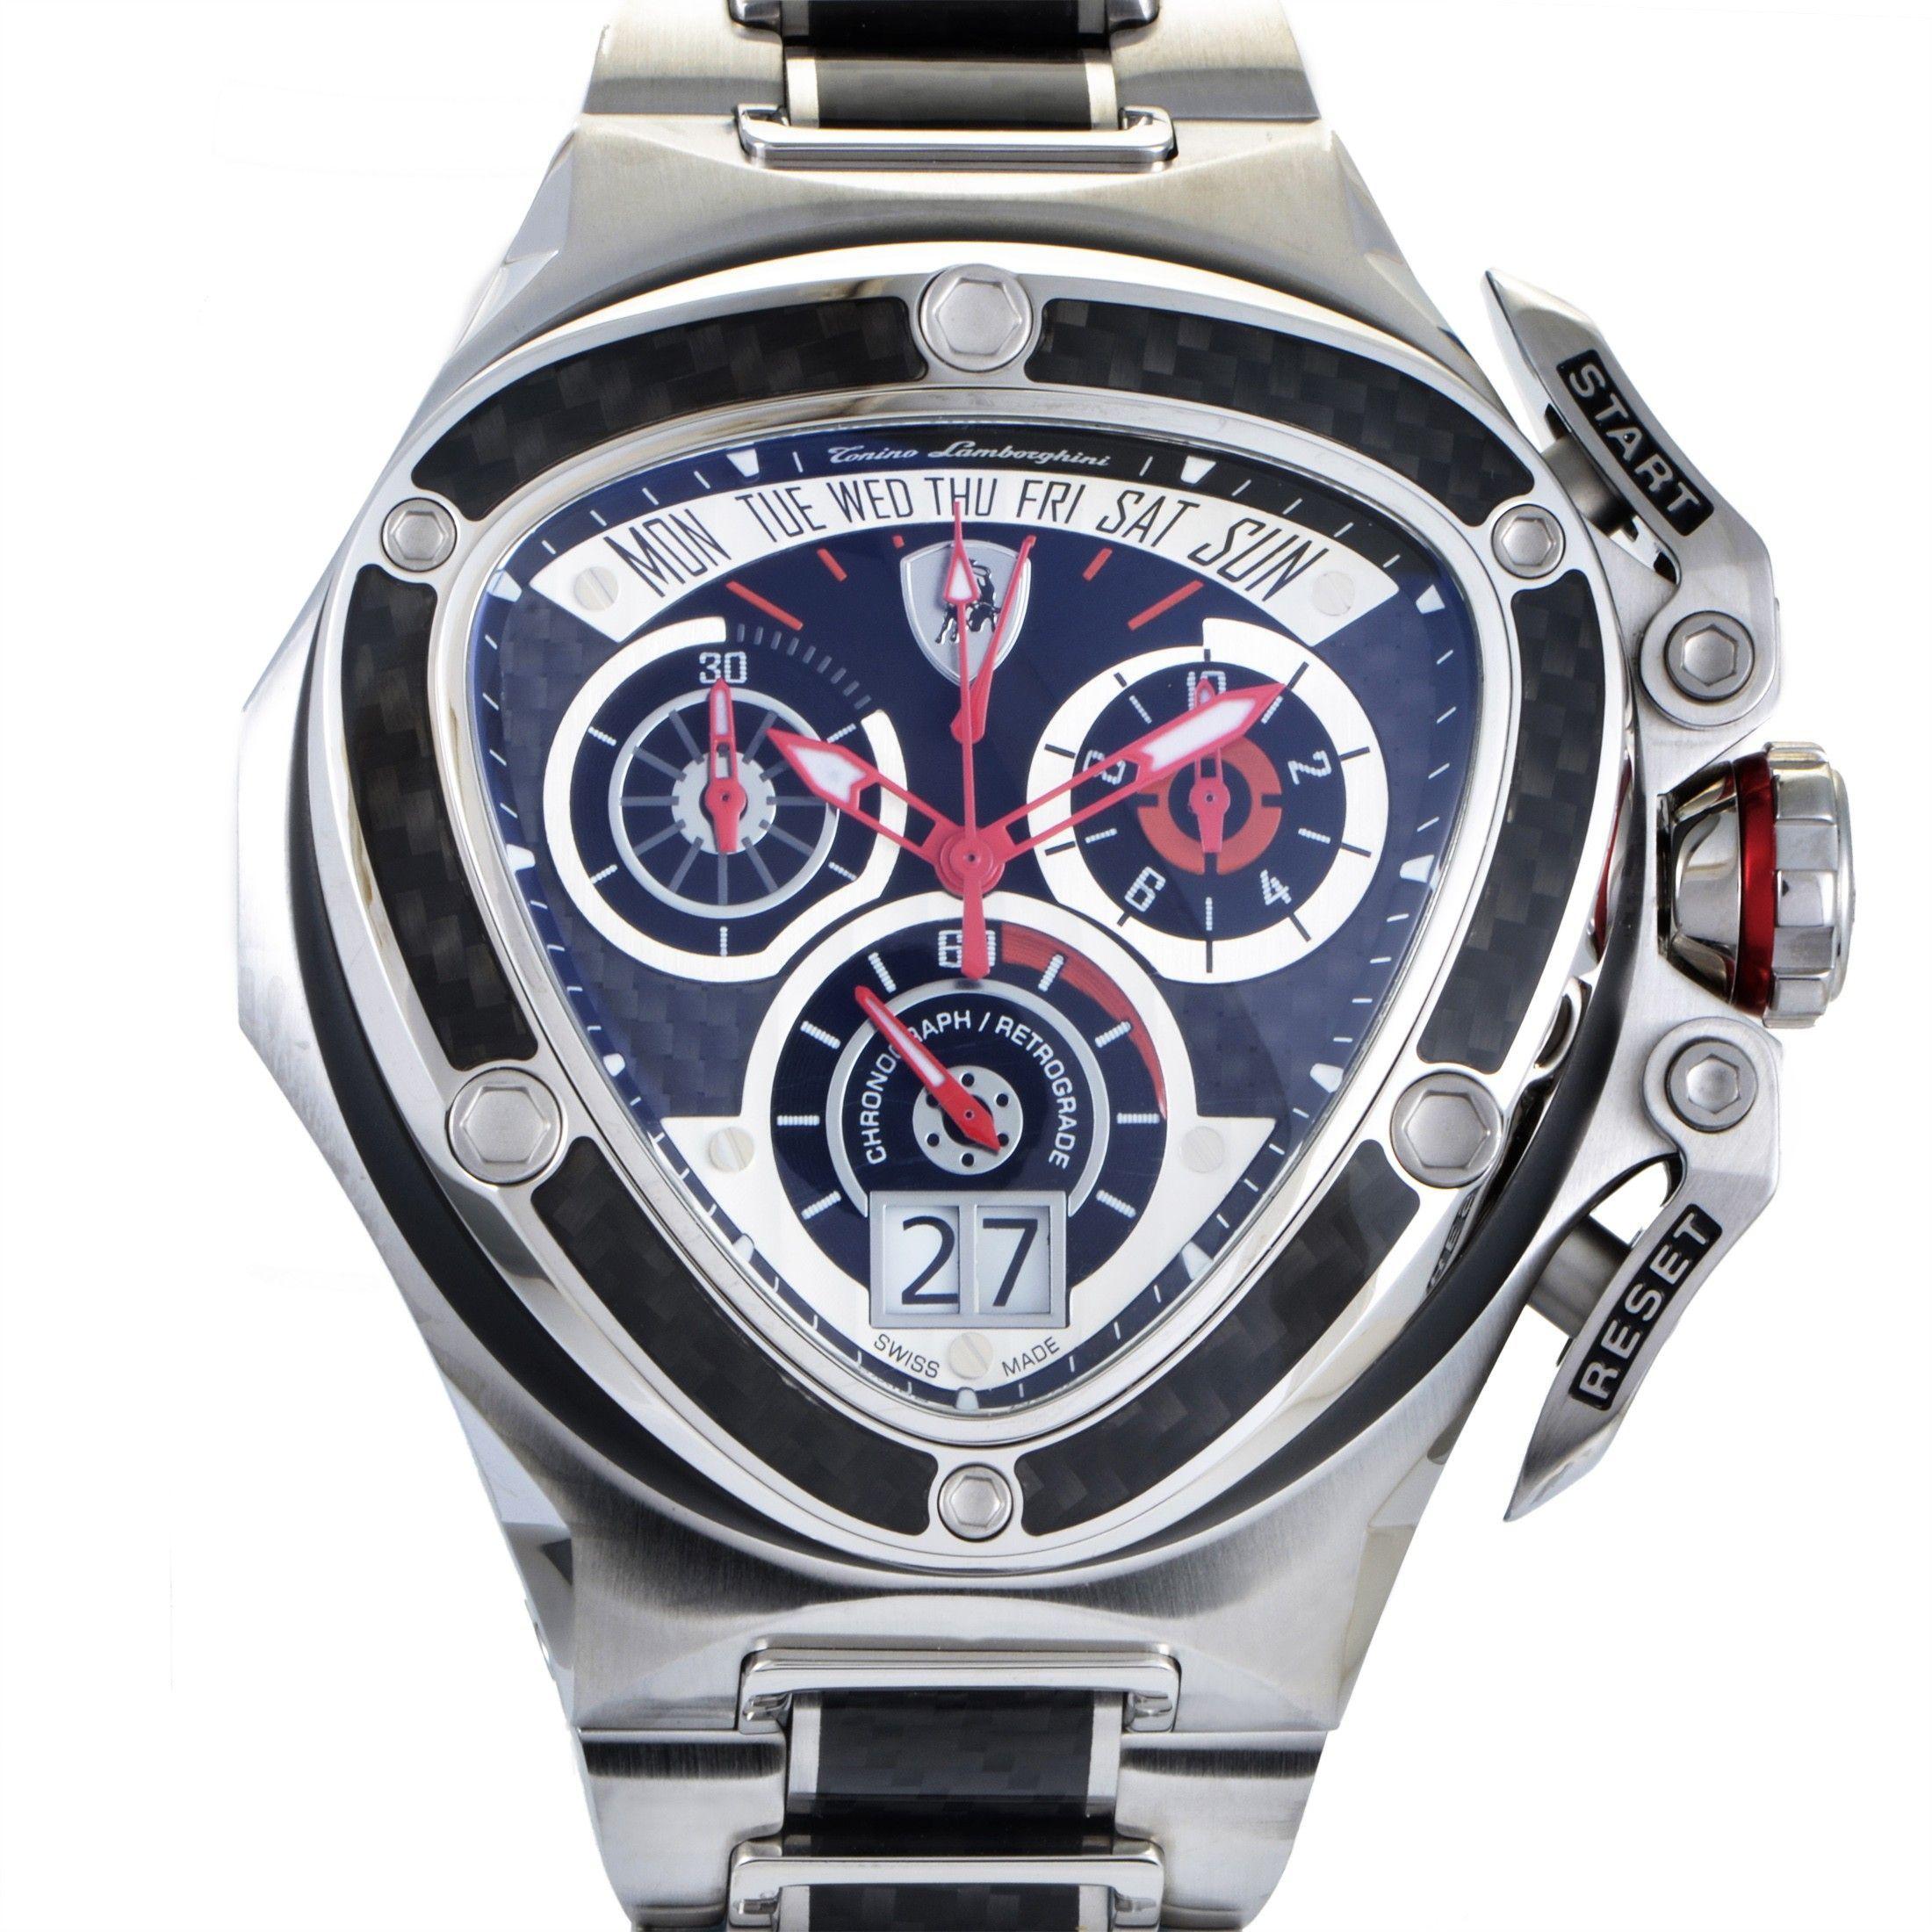 Shop Tonino Lamborghini Spyder Chronograph Quartz Watch 3019 Tl 3019